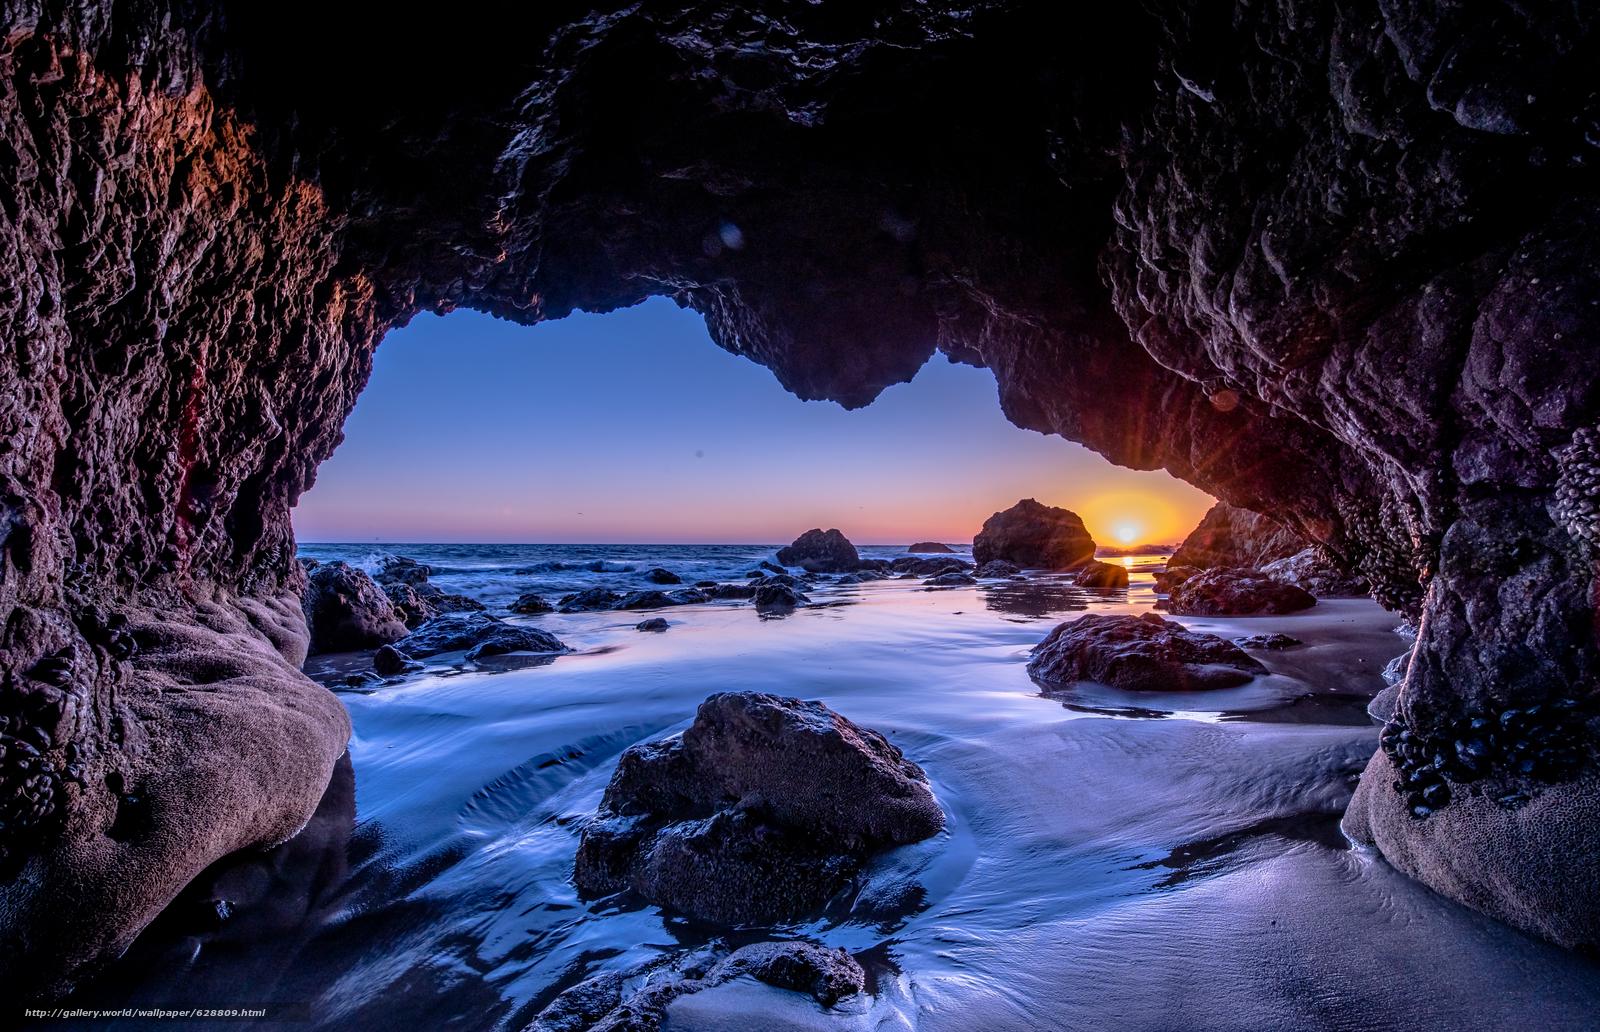 Malibu, Sunset, закат, море, скалы, арка, пейзаж